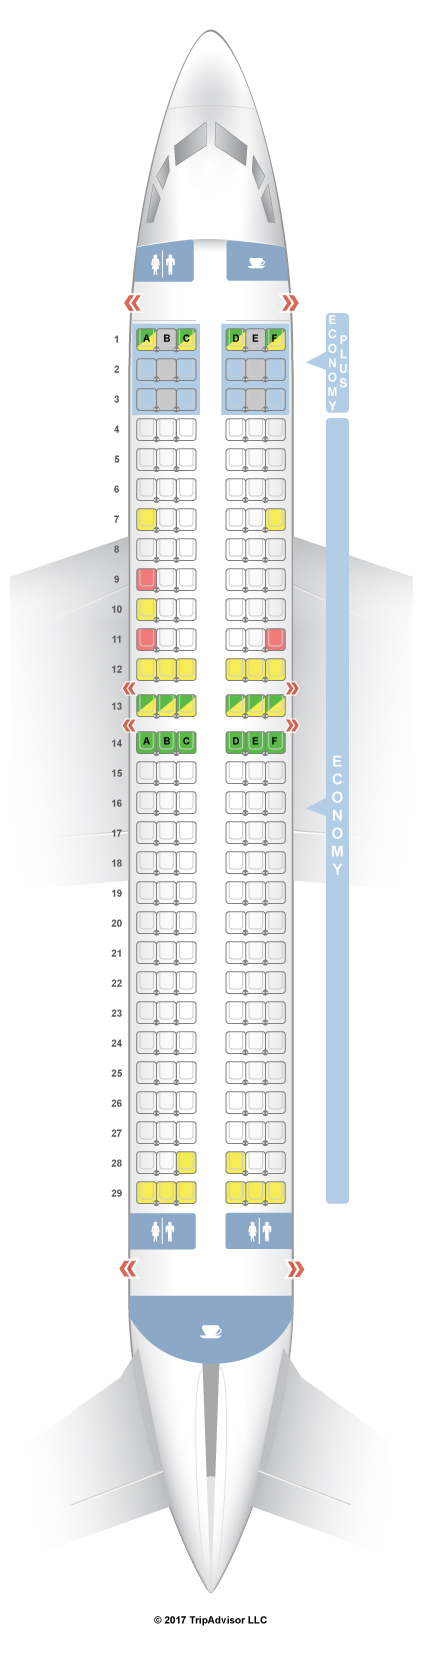 Seatguru Seat Map Westjet Boeing 737 800 738